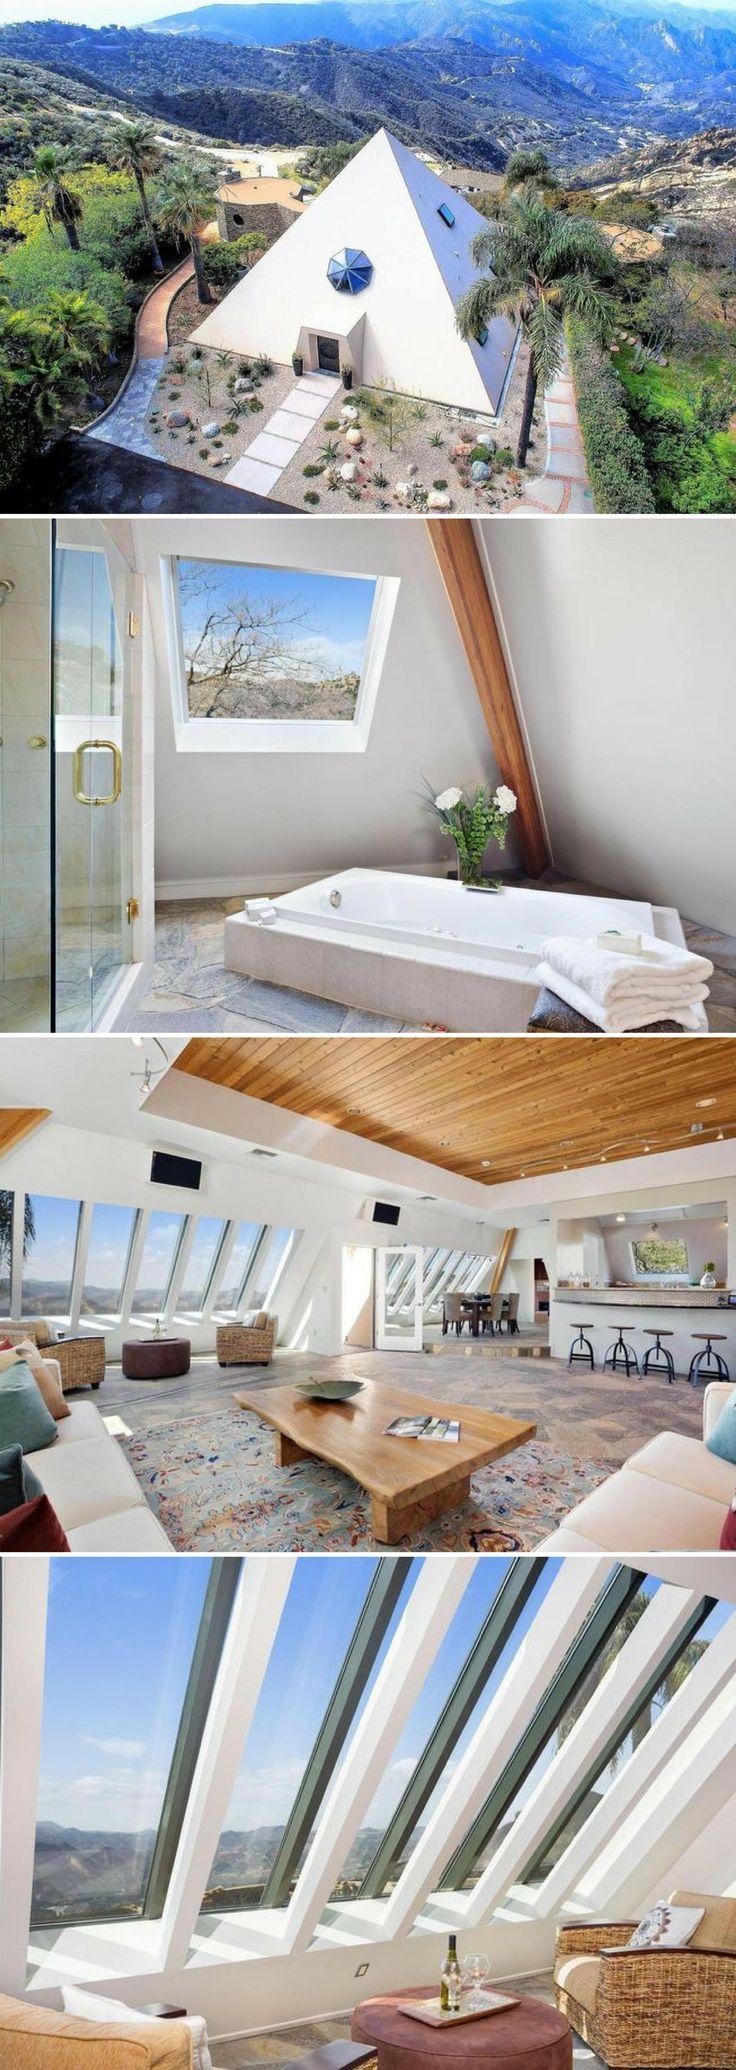 Thinking Outside the Box: Malibu's $3.1M Pyramid House Offers 'Amazing Energy'